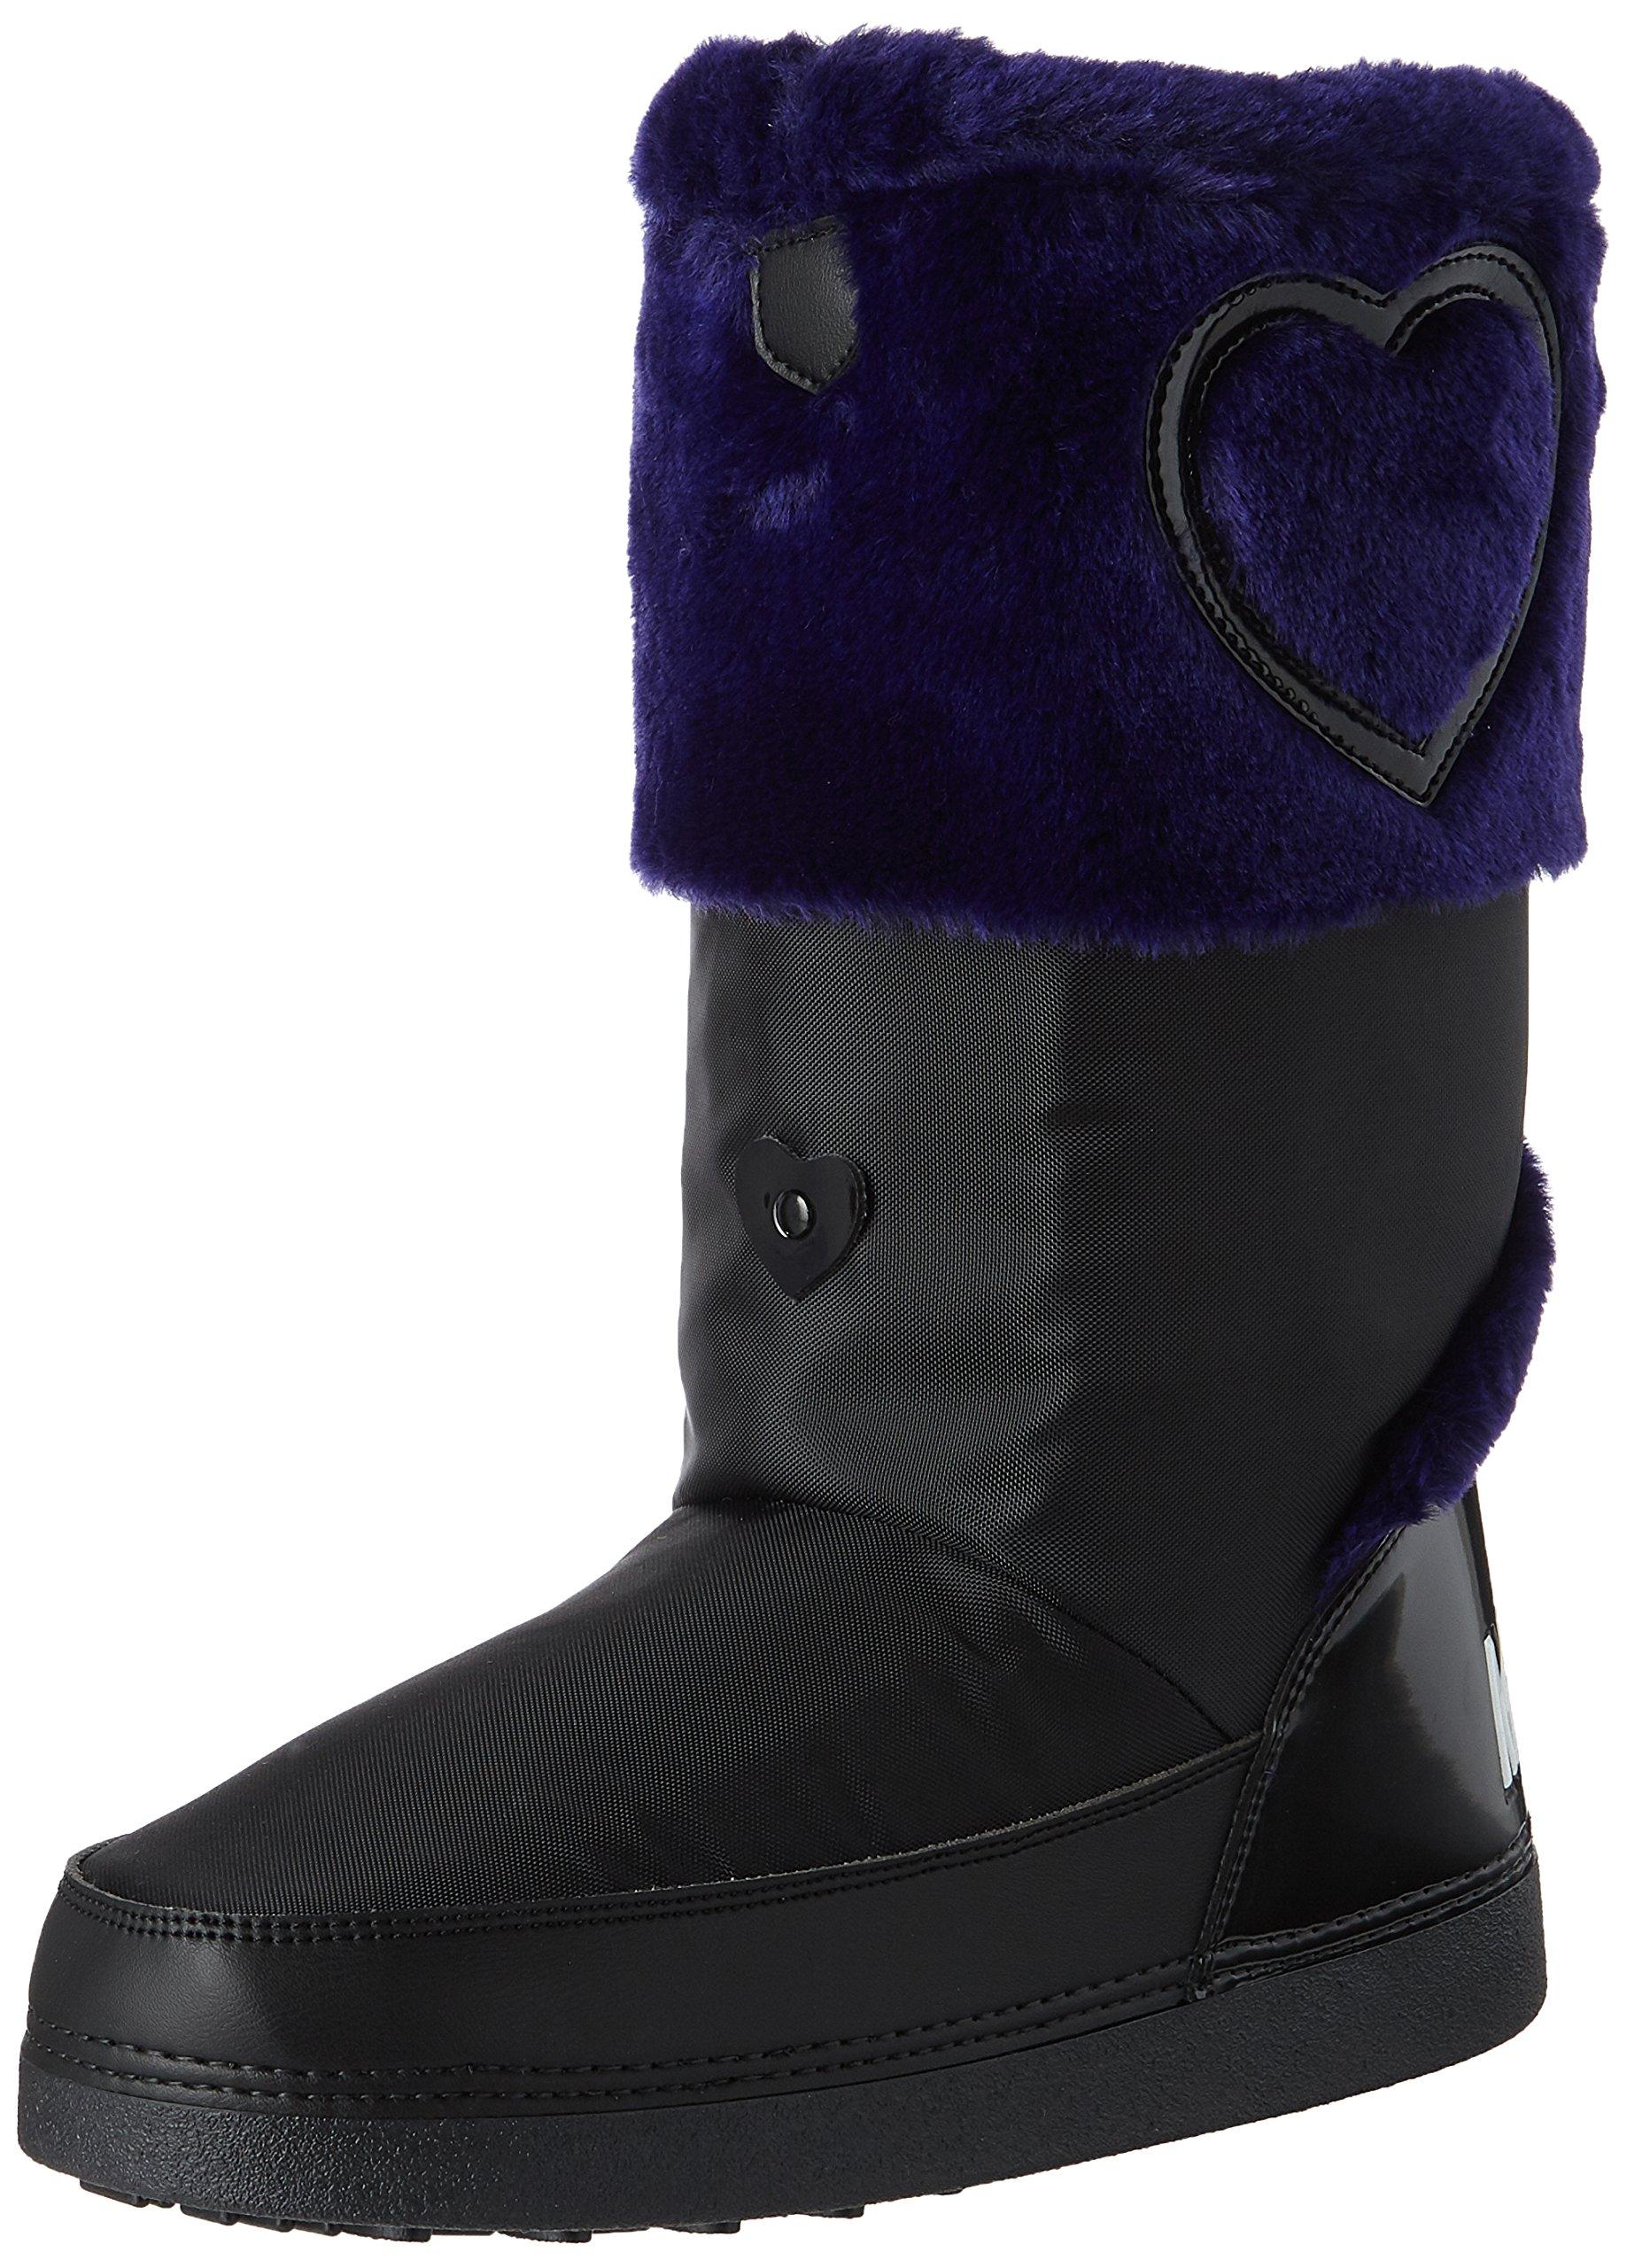 Love Moschino Women's JA24232G04JK200C Fashion Boot, Black/Purple, 35-36 M EU (5-6 US)